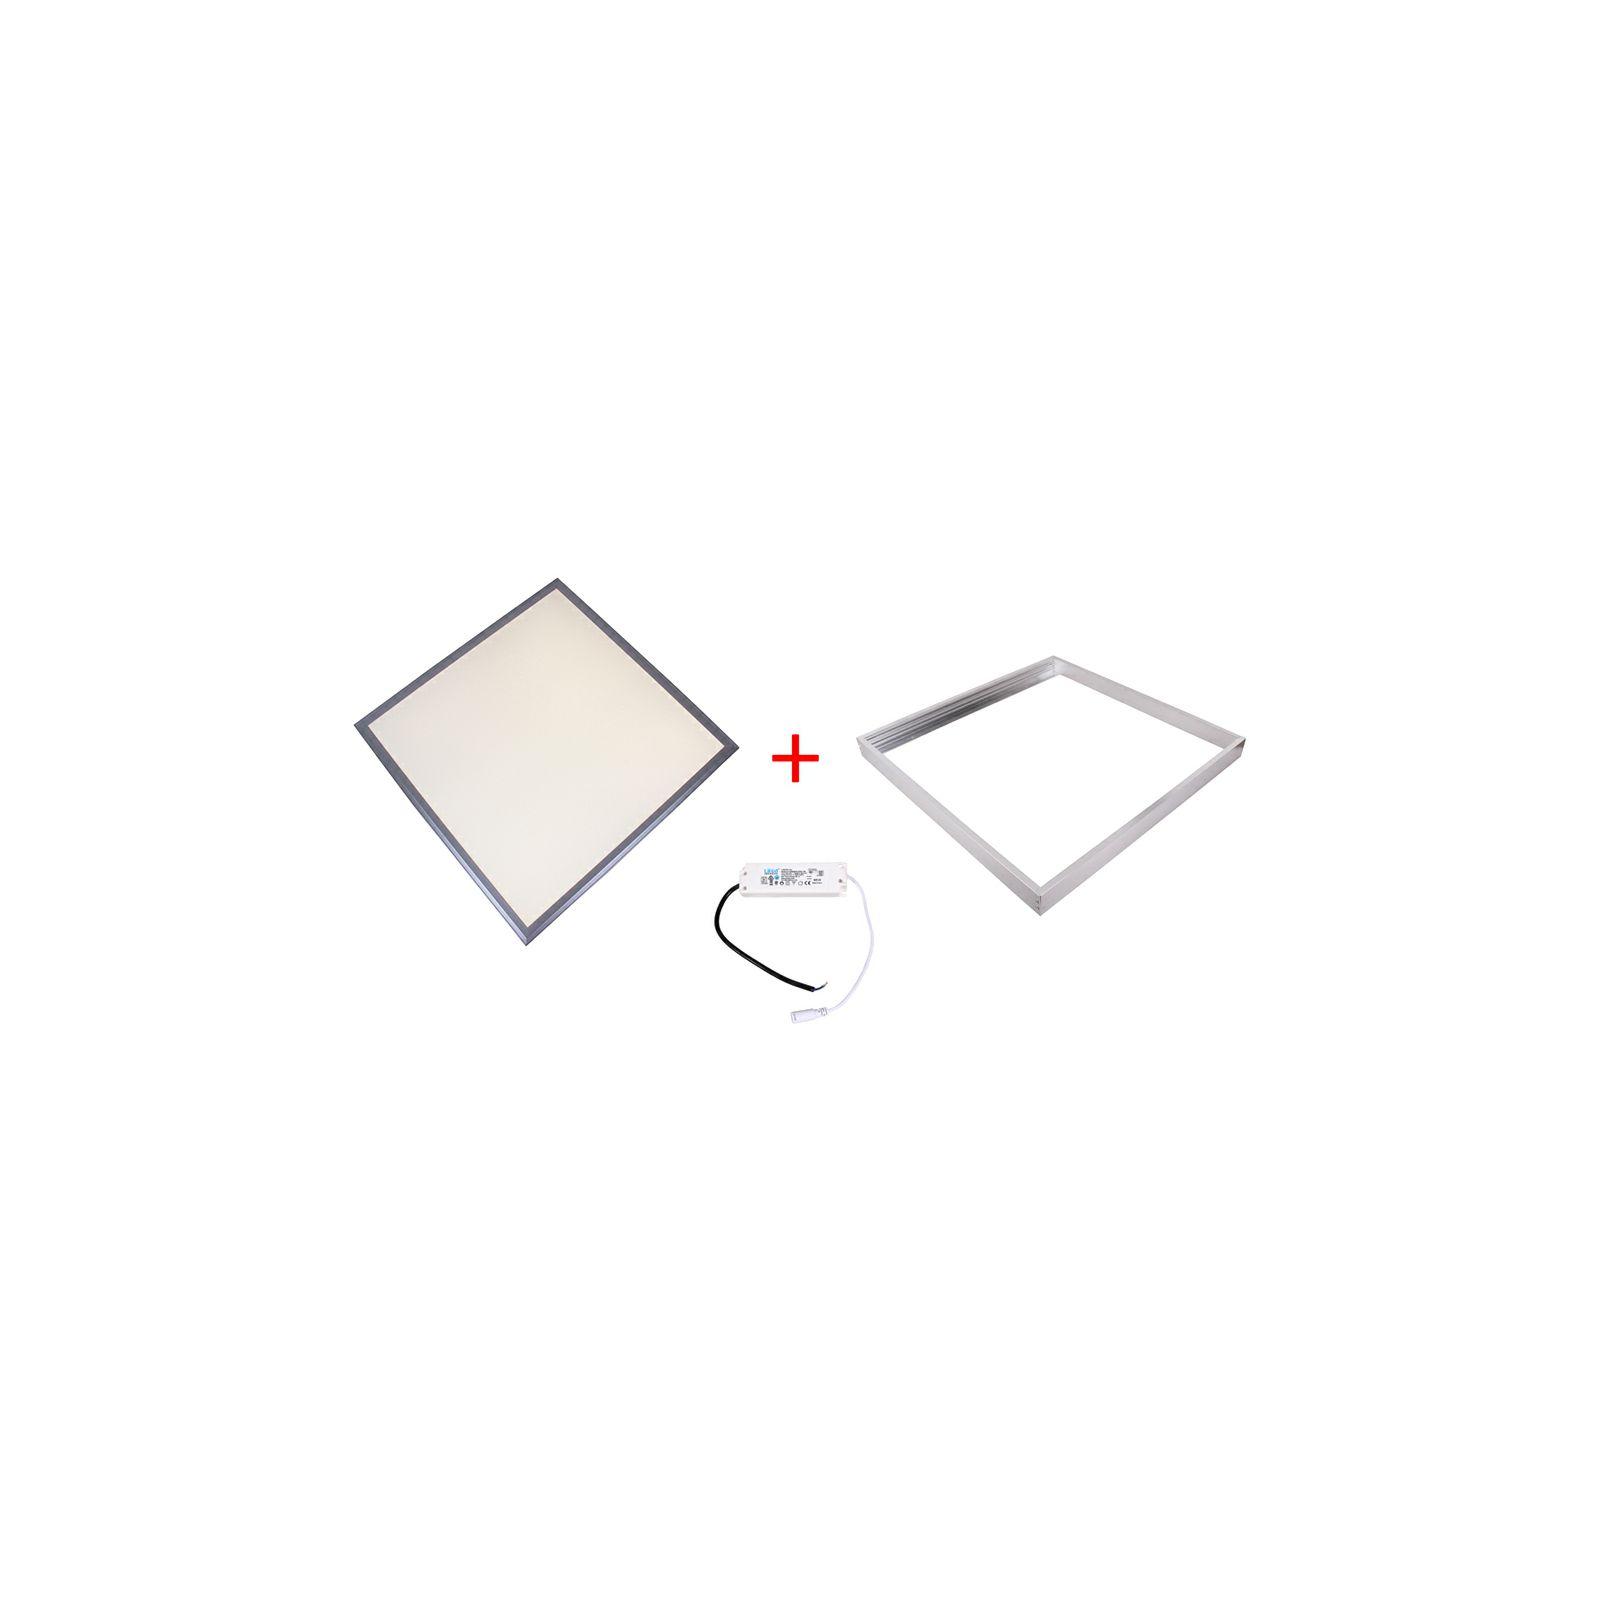 Patona LED panel 600x600x9 frame trasnformer 36W 3300lm 4000-4500K natur white AC 200-240V Frame Transformer complet set 60x60x0,9cm